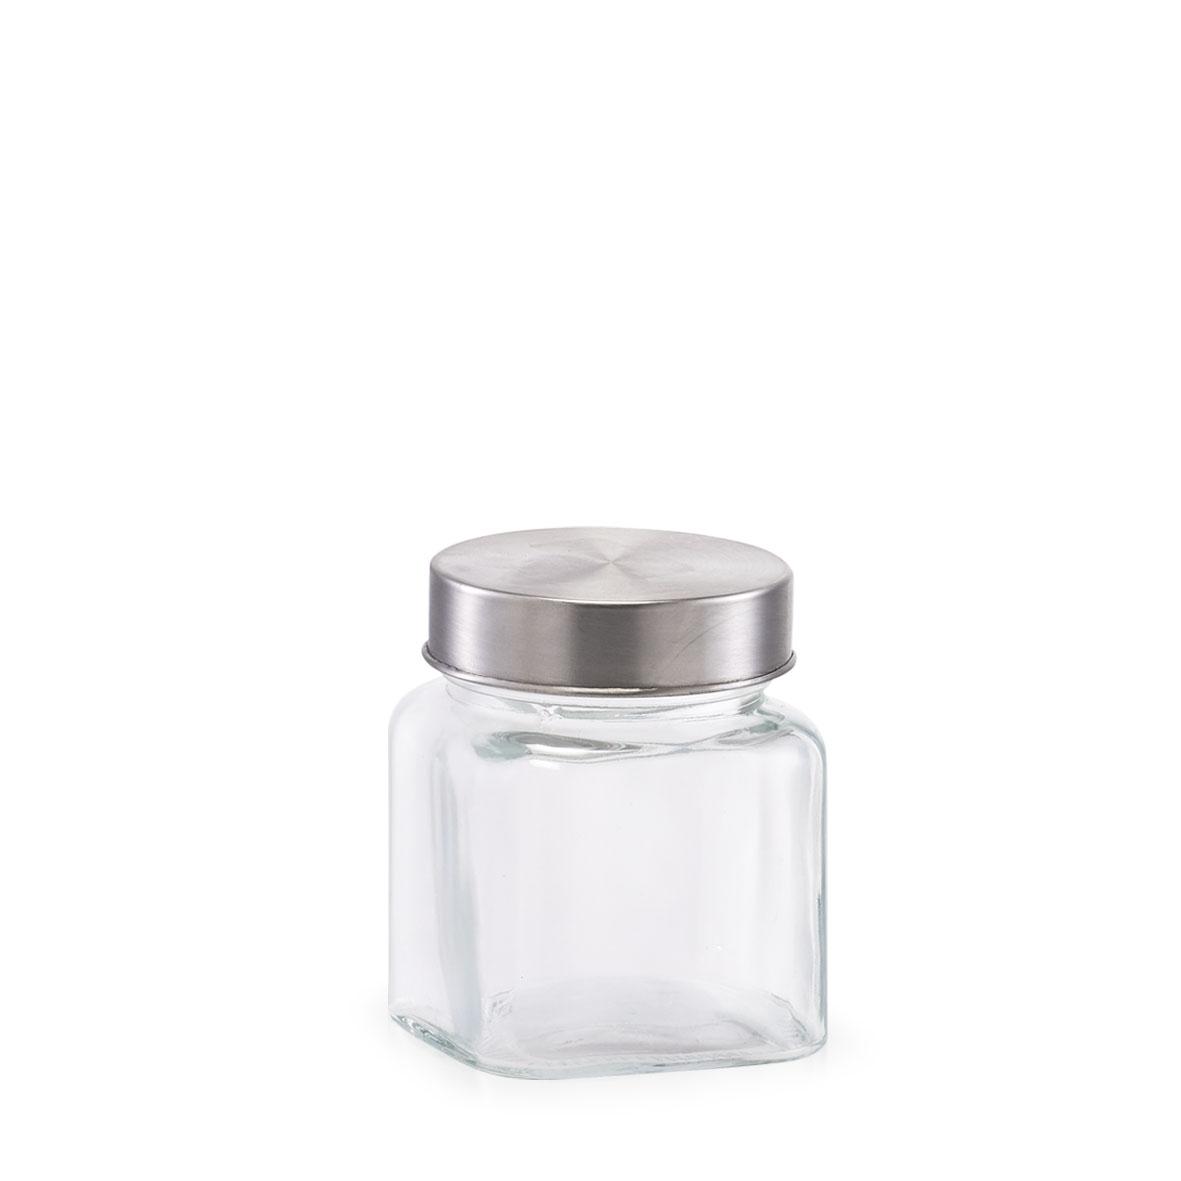 Recipient pentru depozitare din sticla Mini, capac metalic, 250 ml, Ø7,5xH9,1 cm( 476735)